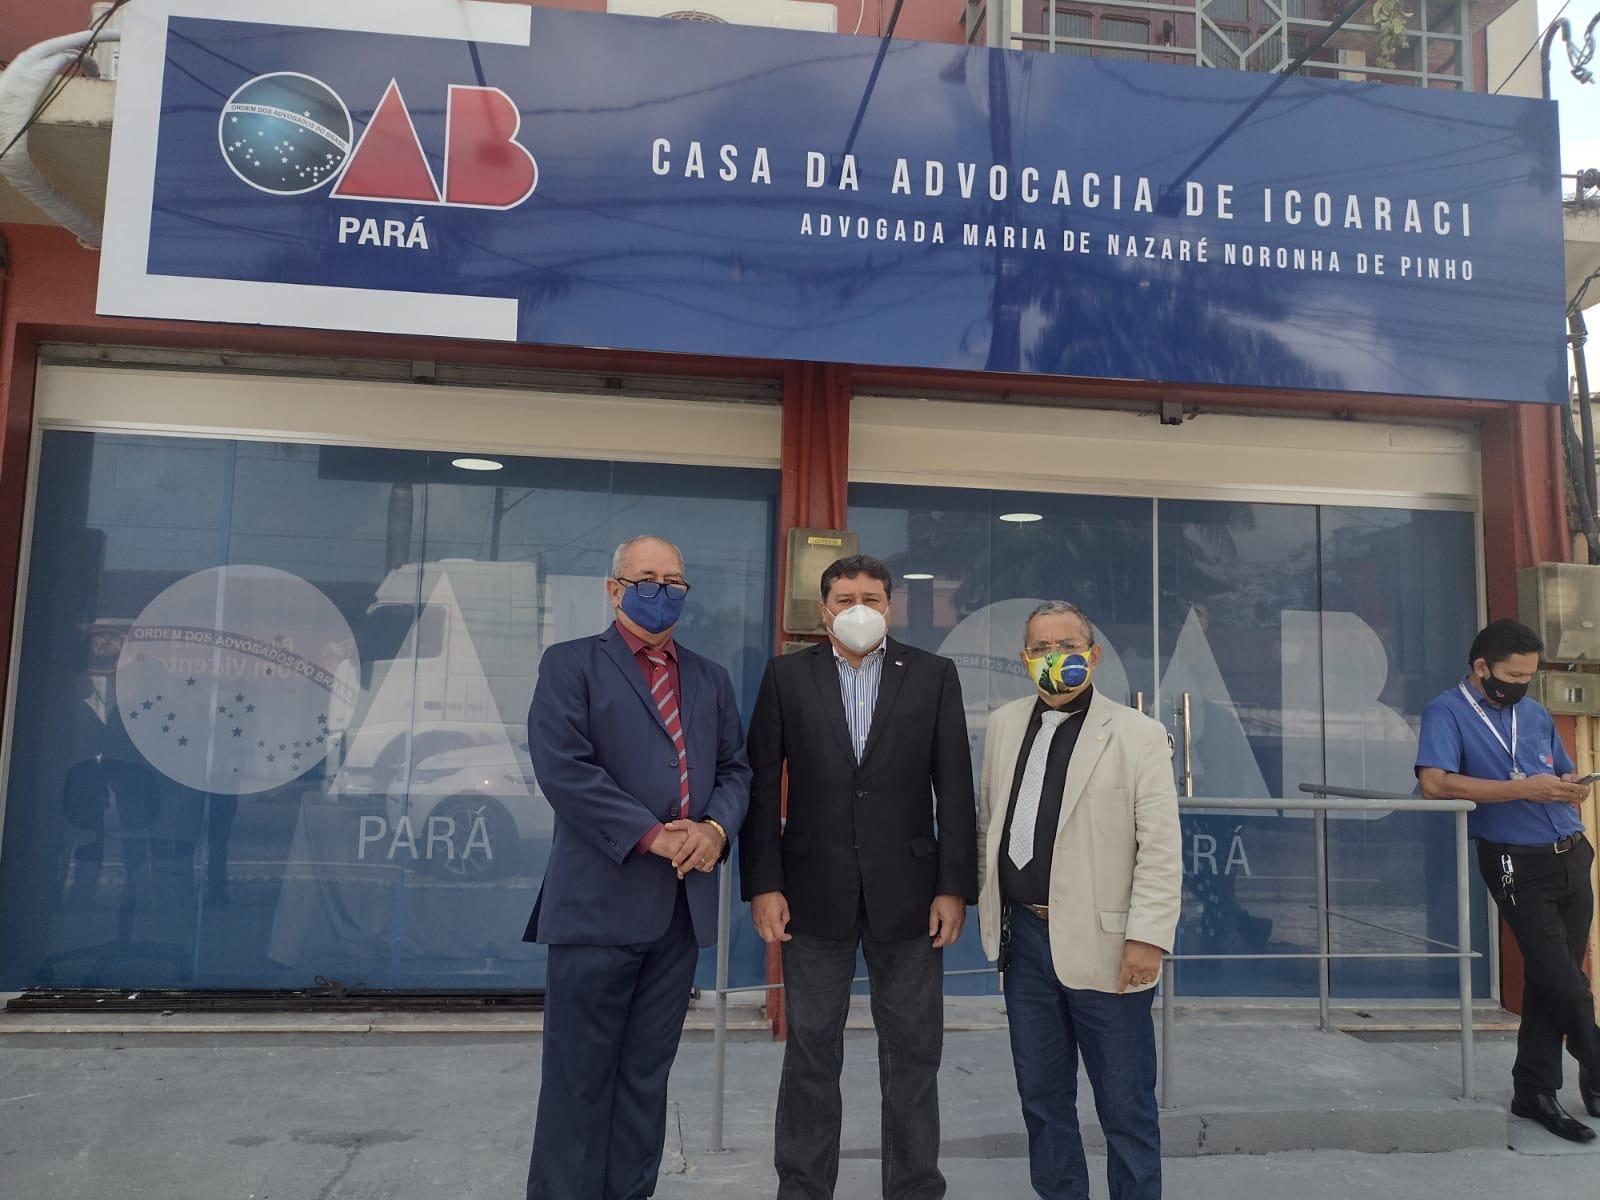 OAB/PARÁ inaugurou a Casa do Advogado de Icoaraci